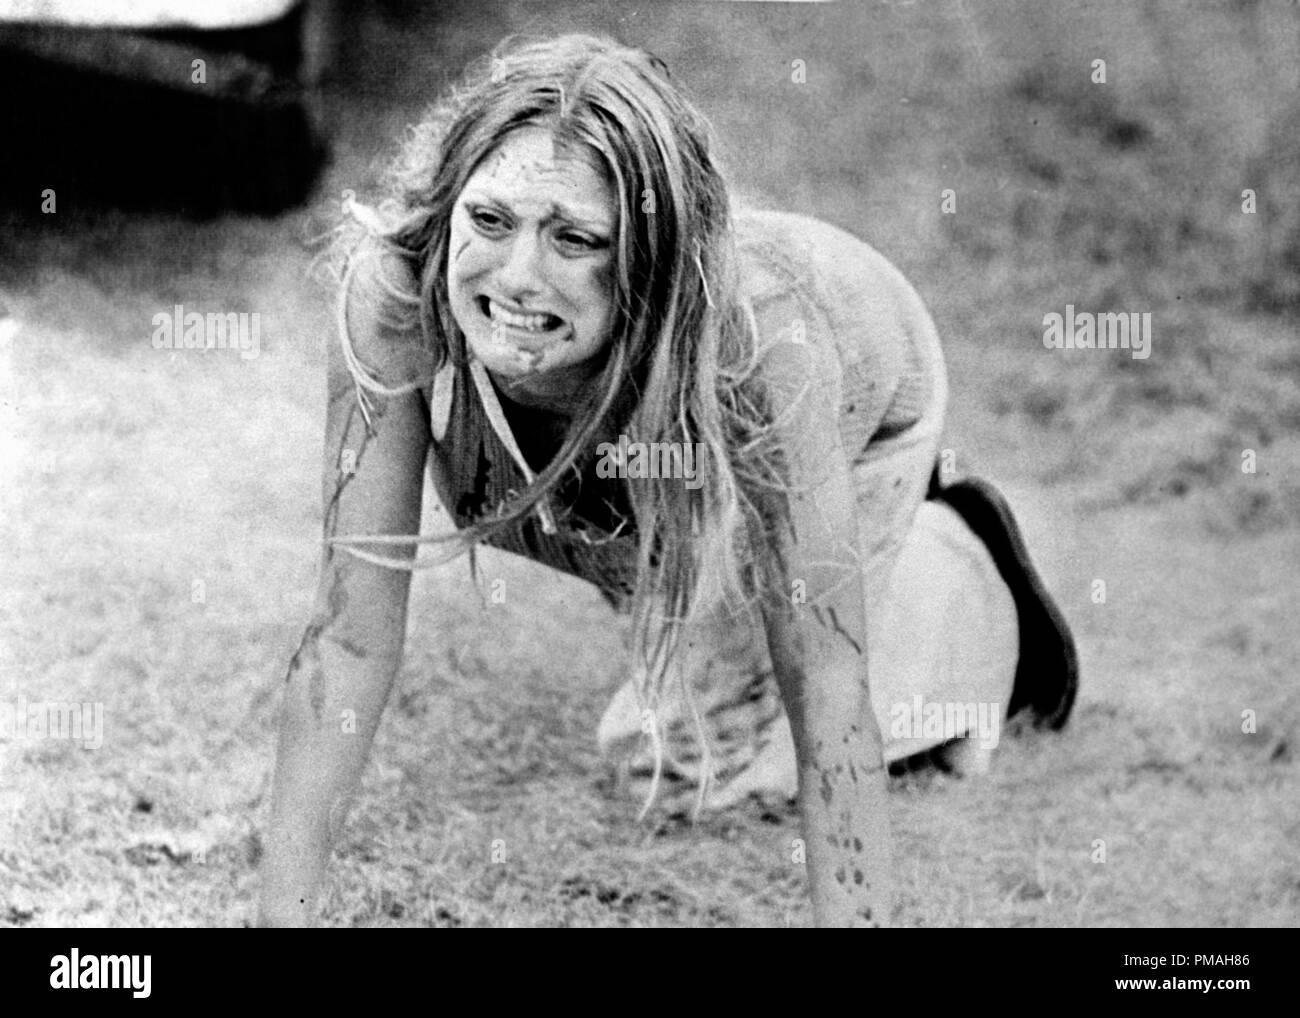 Tarana Raja Kapoor 2010,Mona Ray Porno pictures Kristen Alderson born May 29, 1991 (age 27),Melissa Bergland